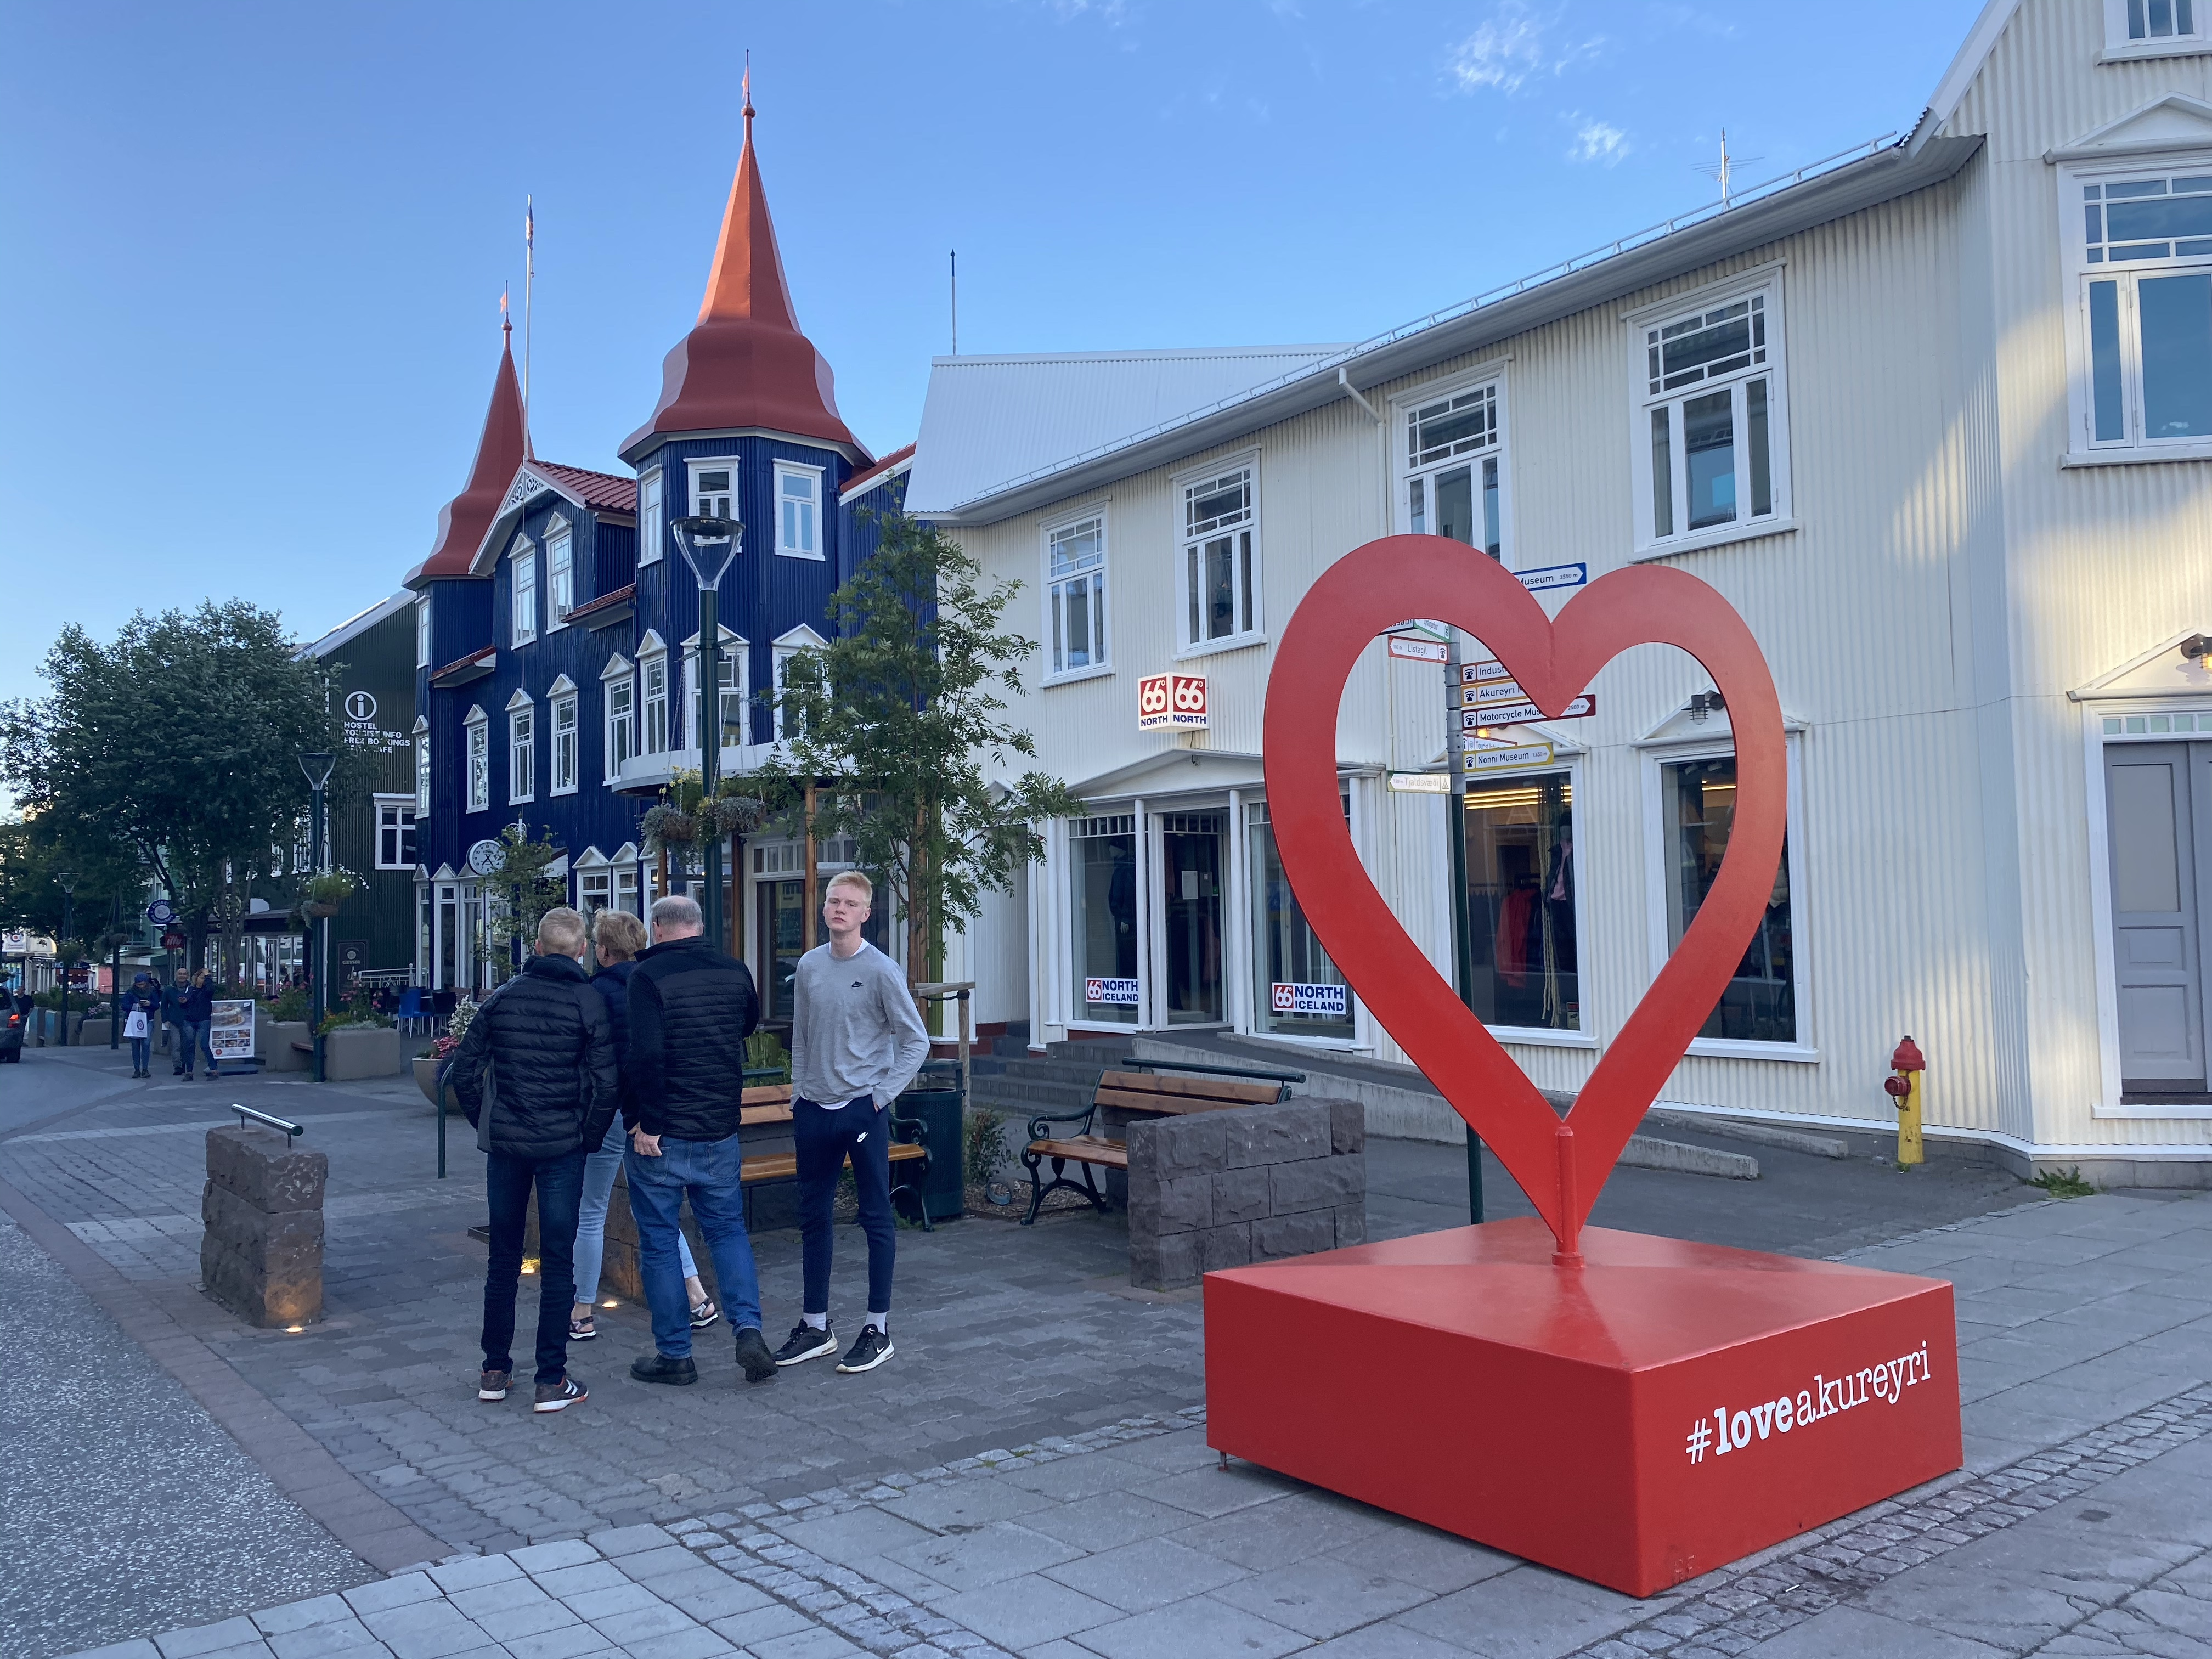 La città di Akureyri in Islanda